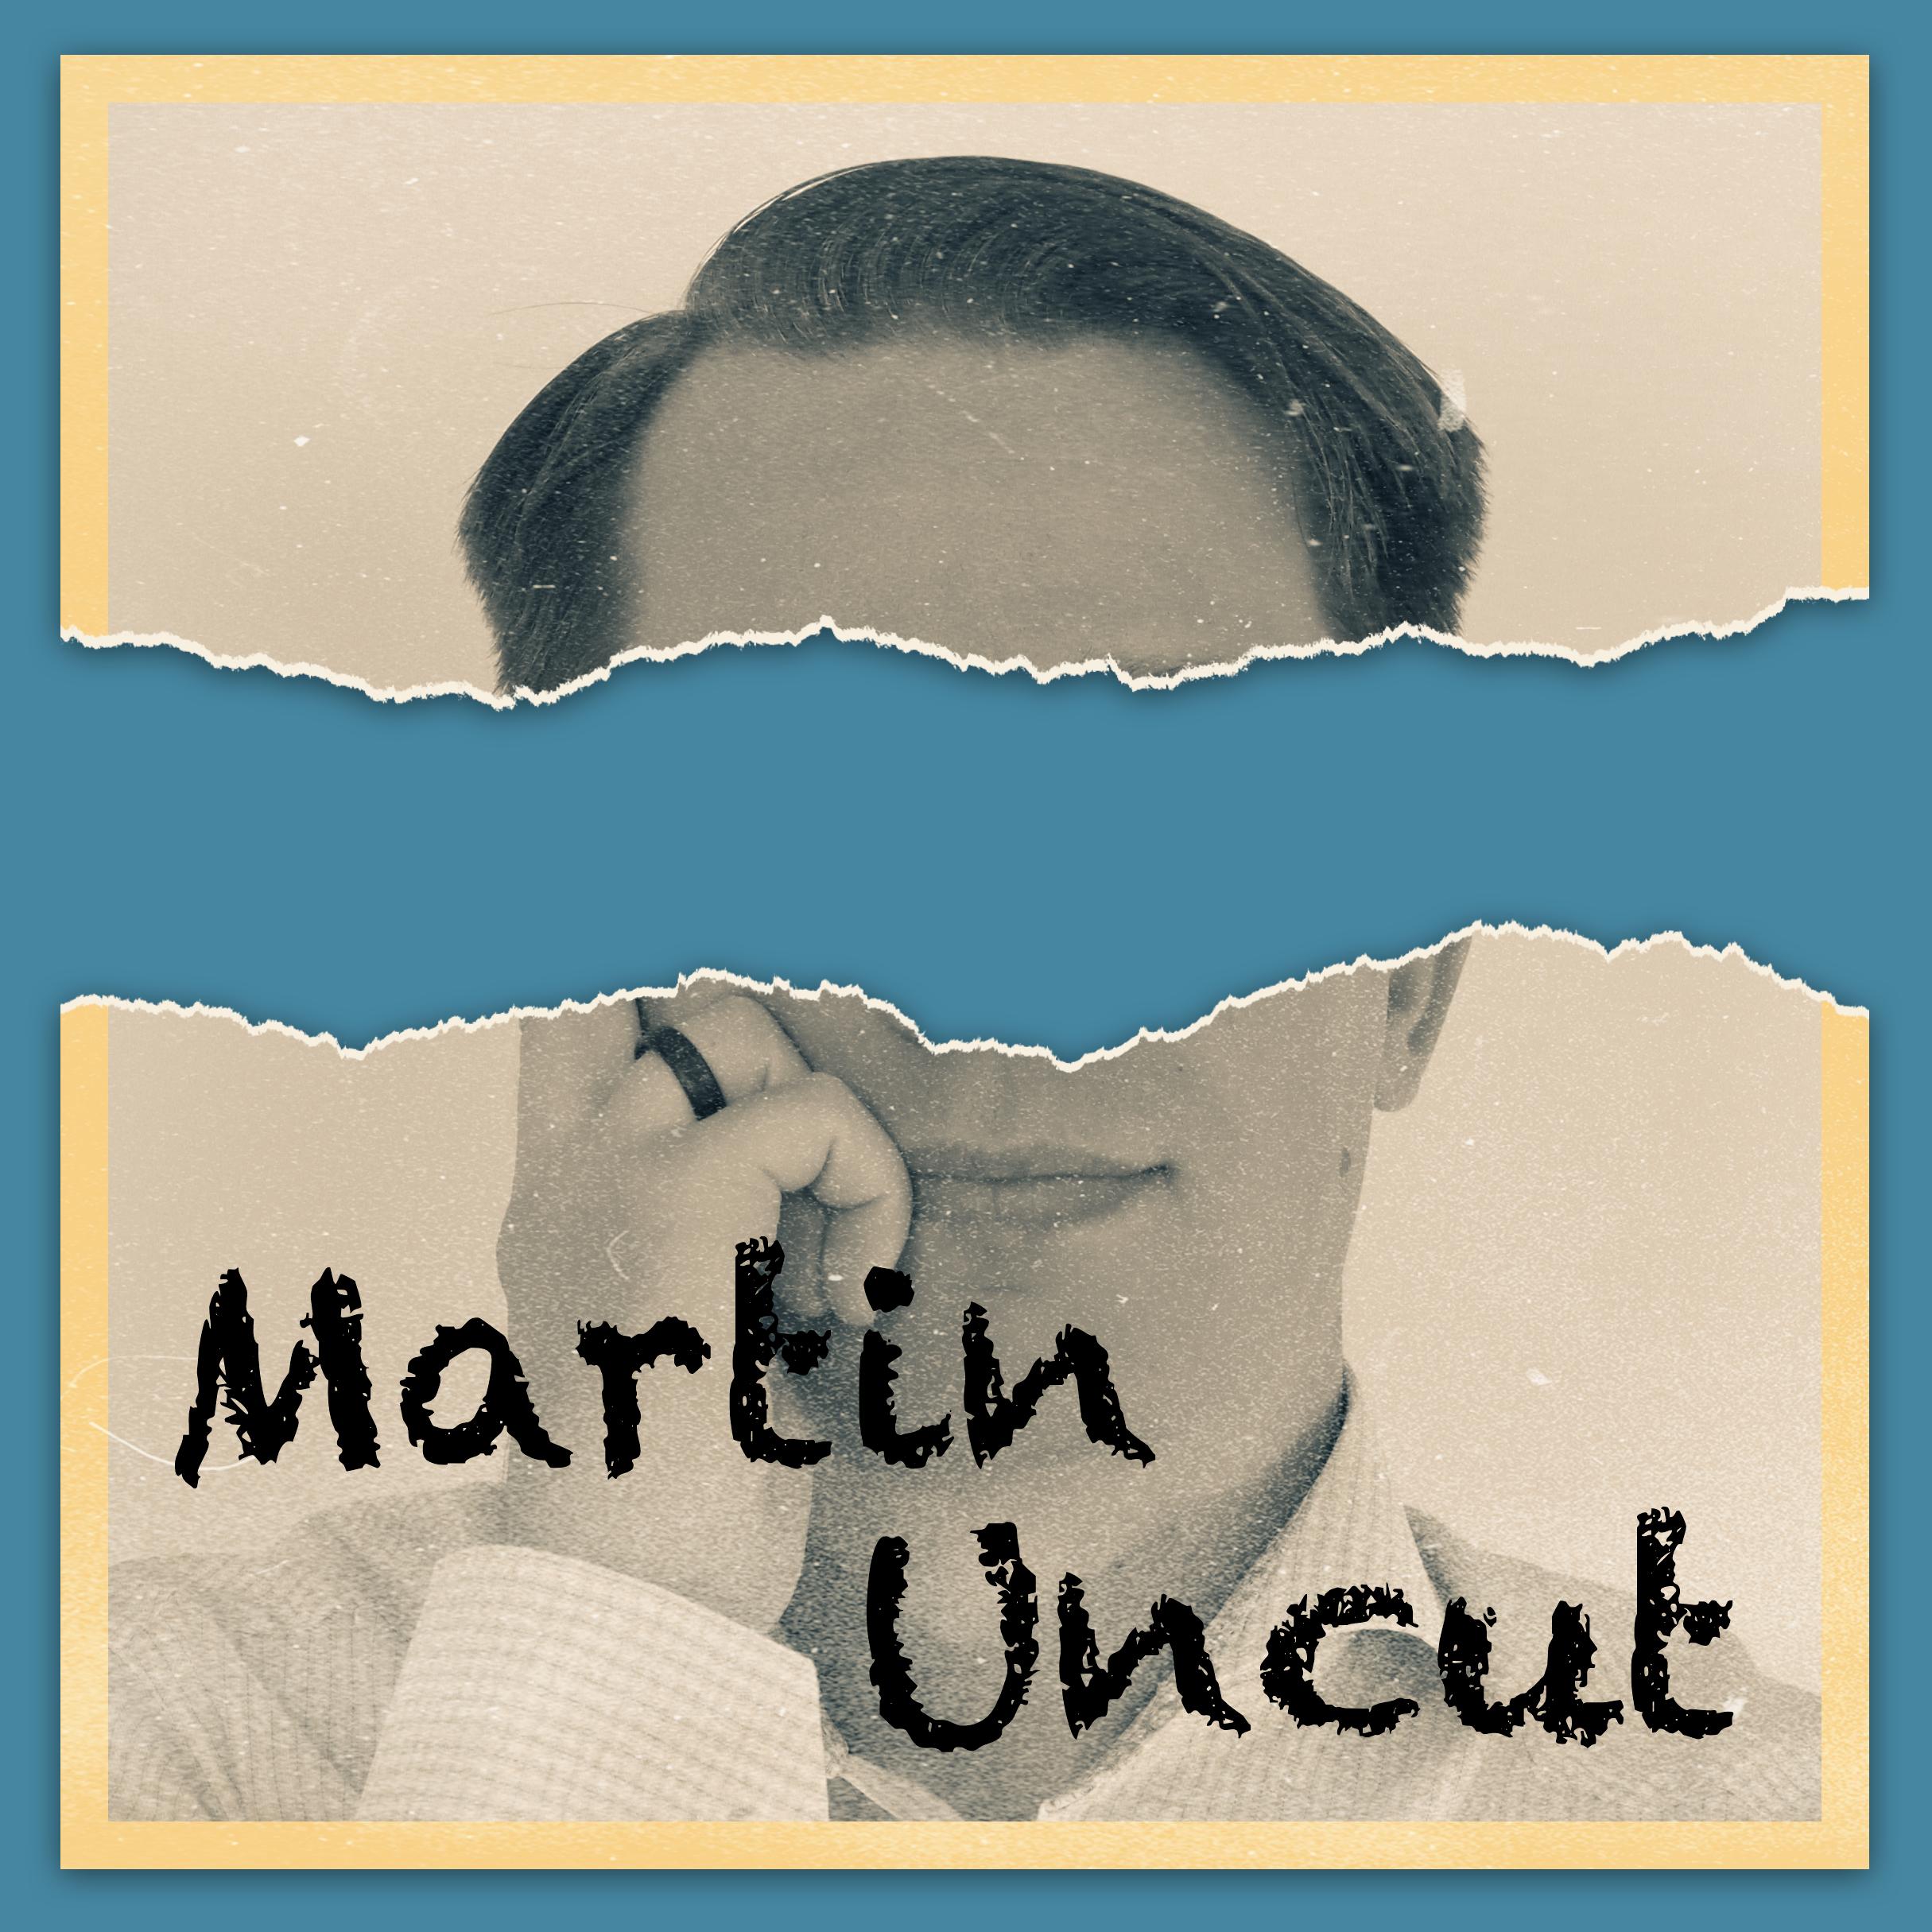 Martin Uncut